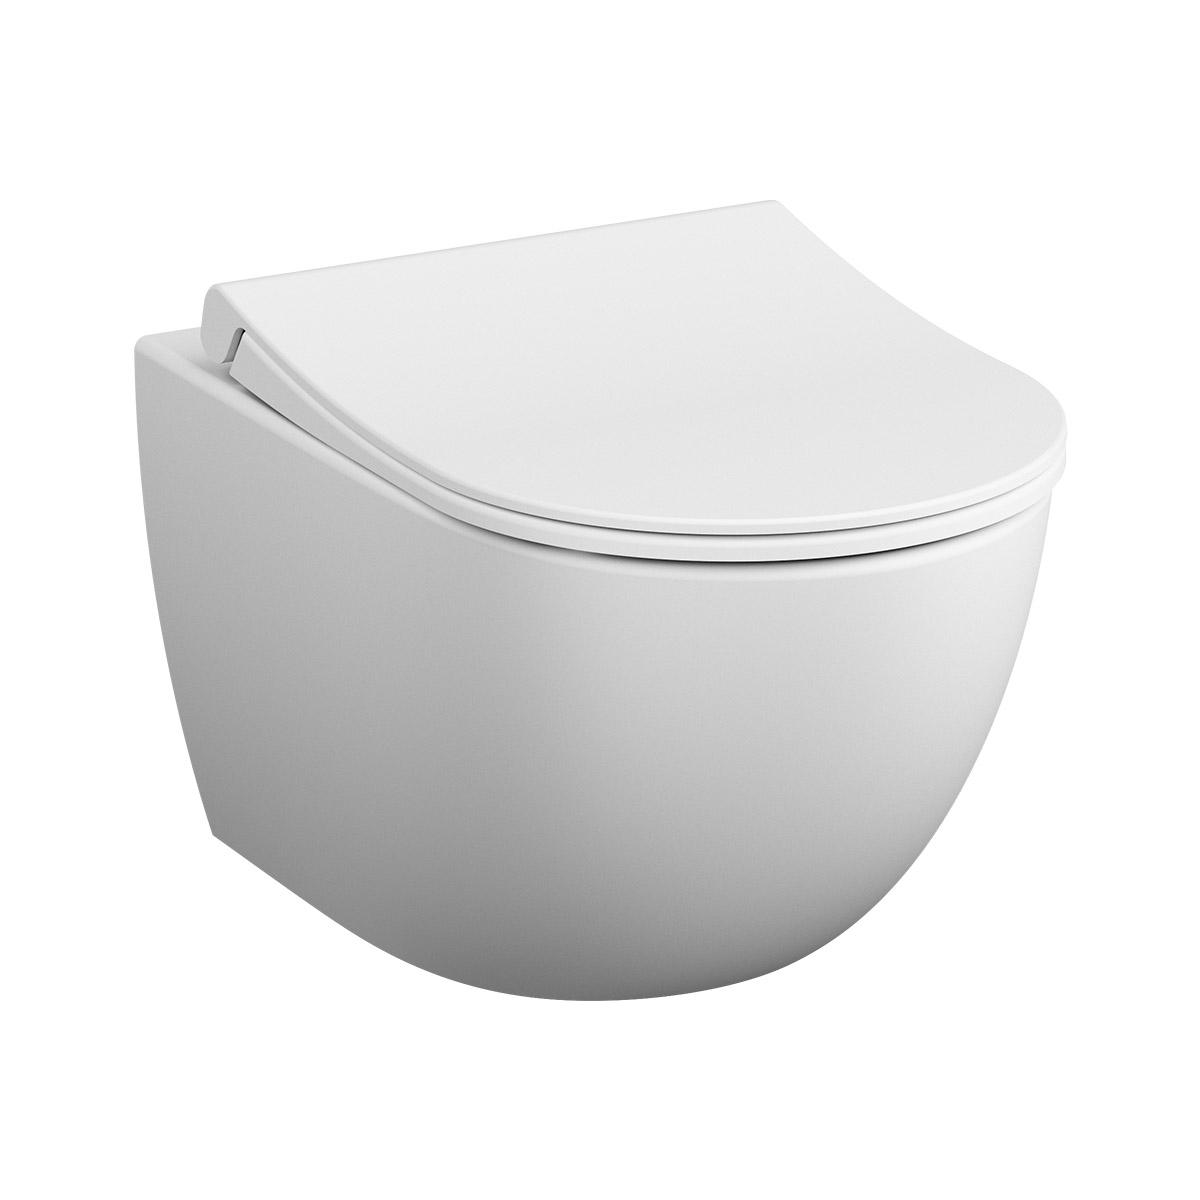 Sento Wand-WC VitrA Flush 2.0, Edelweiß